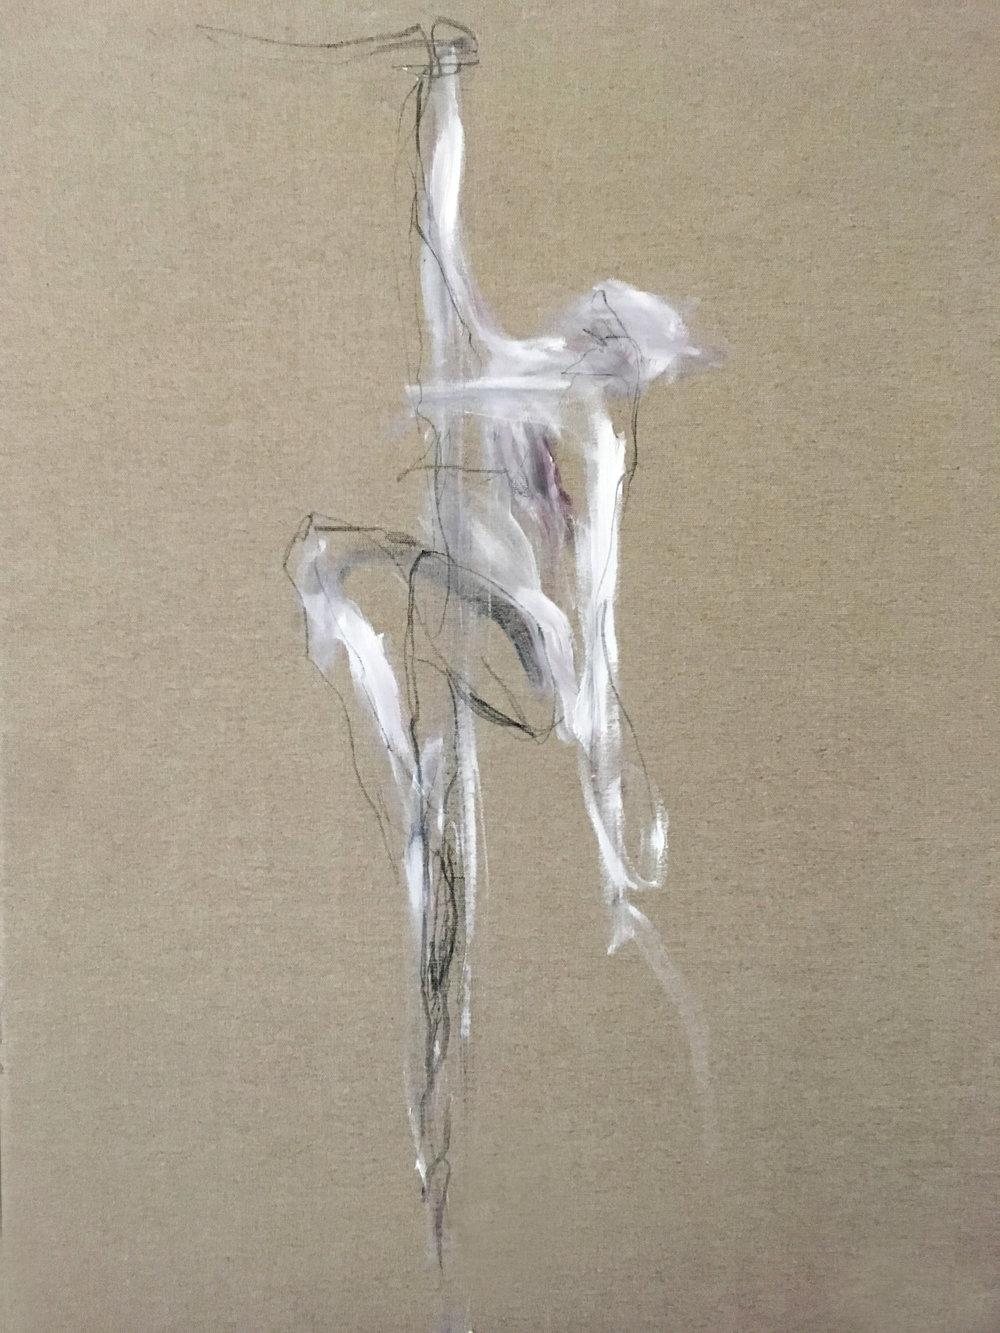 Charcoal_Oilbar_Unprimed canvas_40cm x 60cm